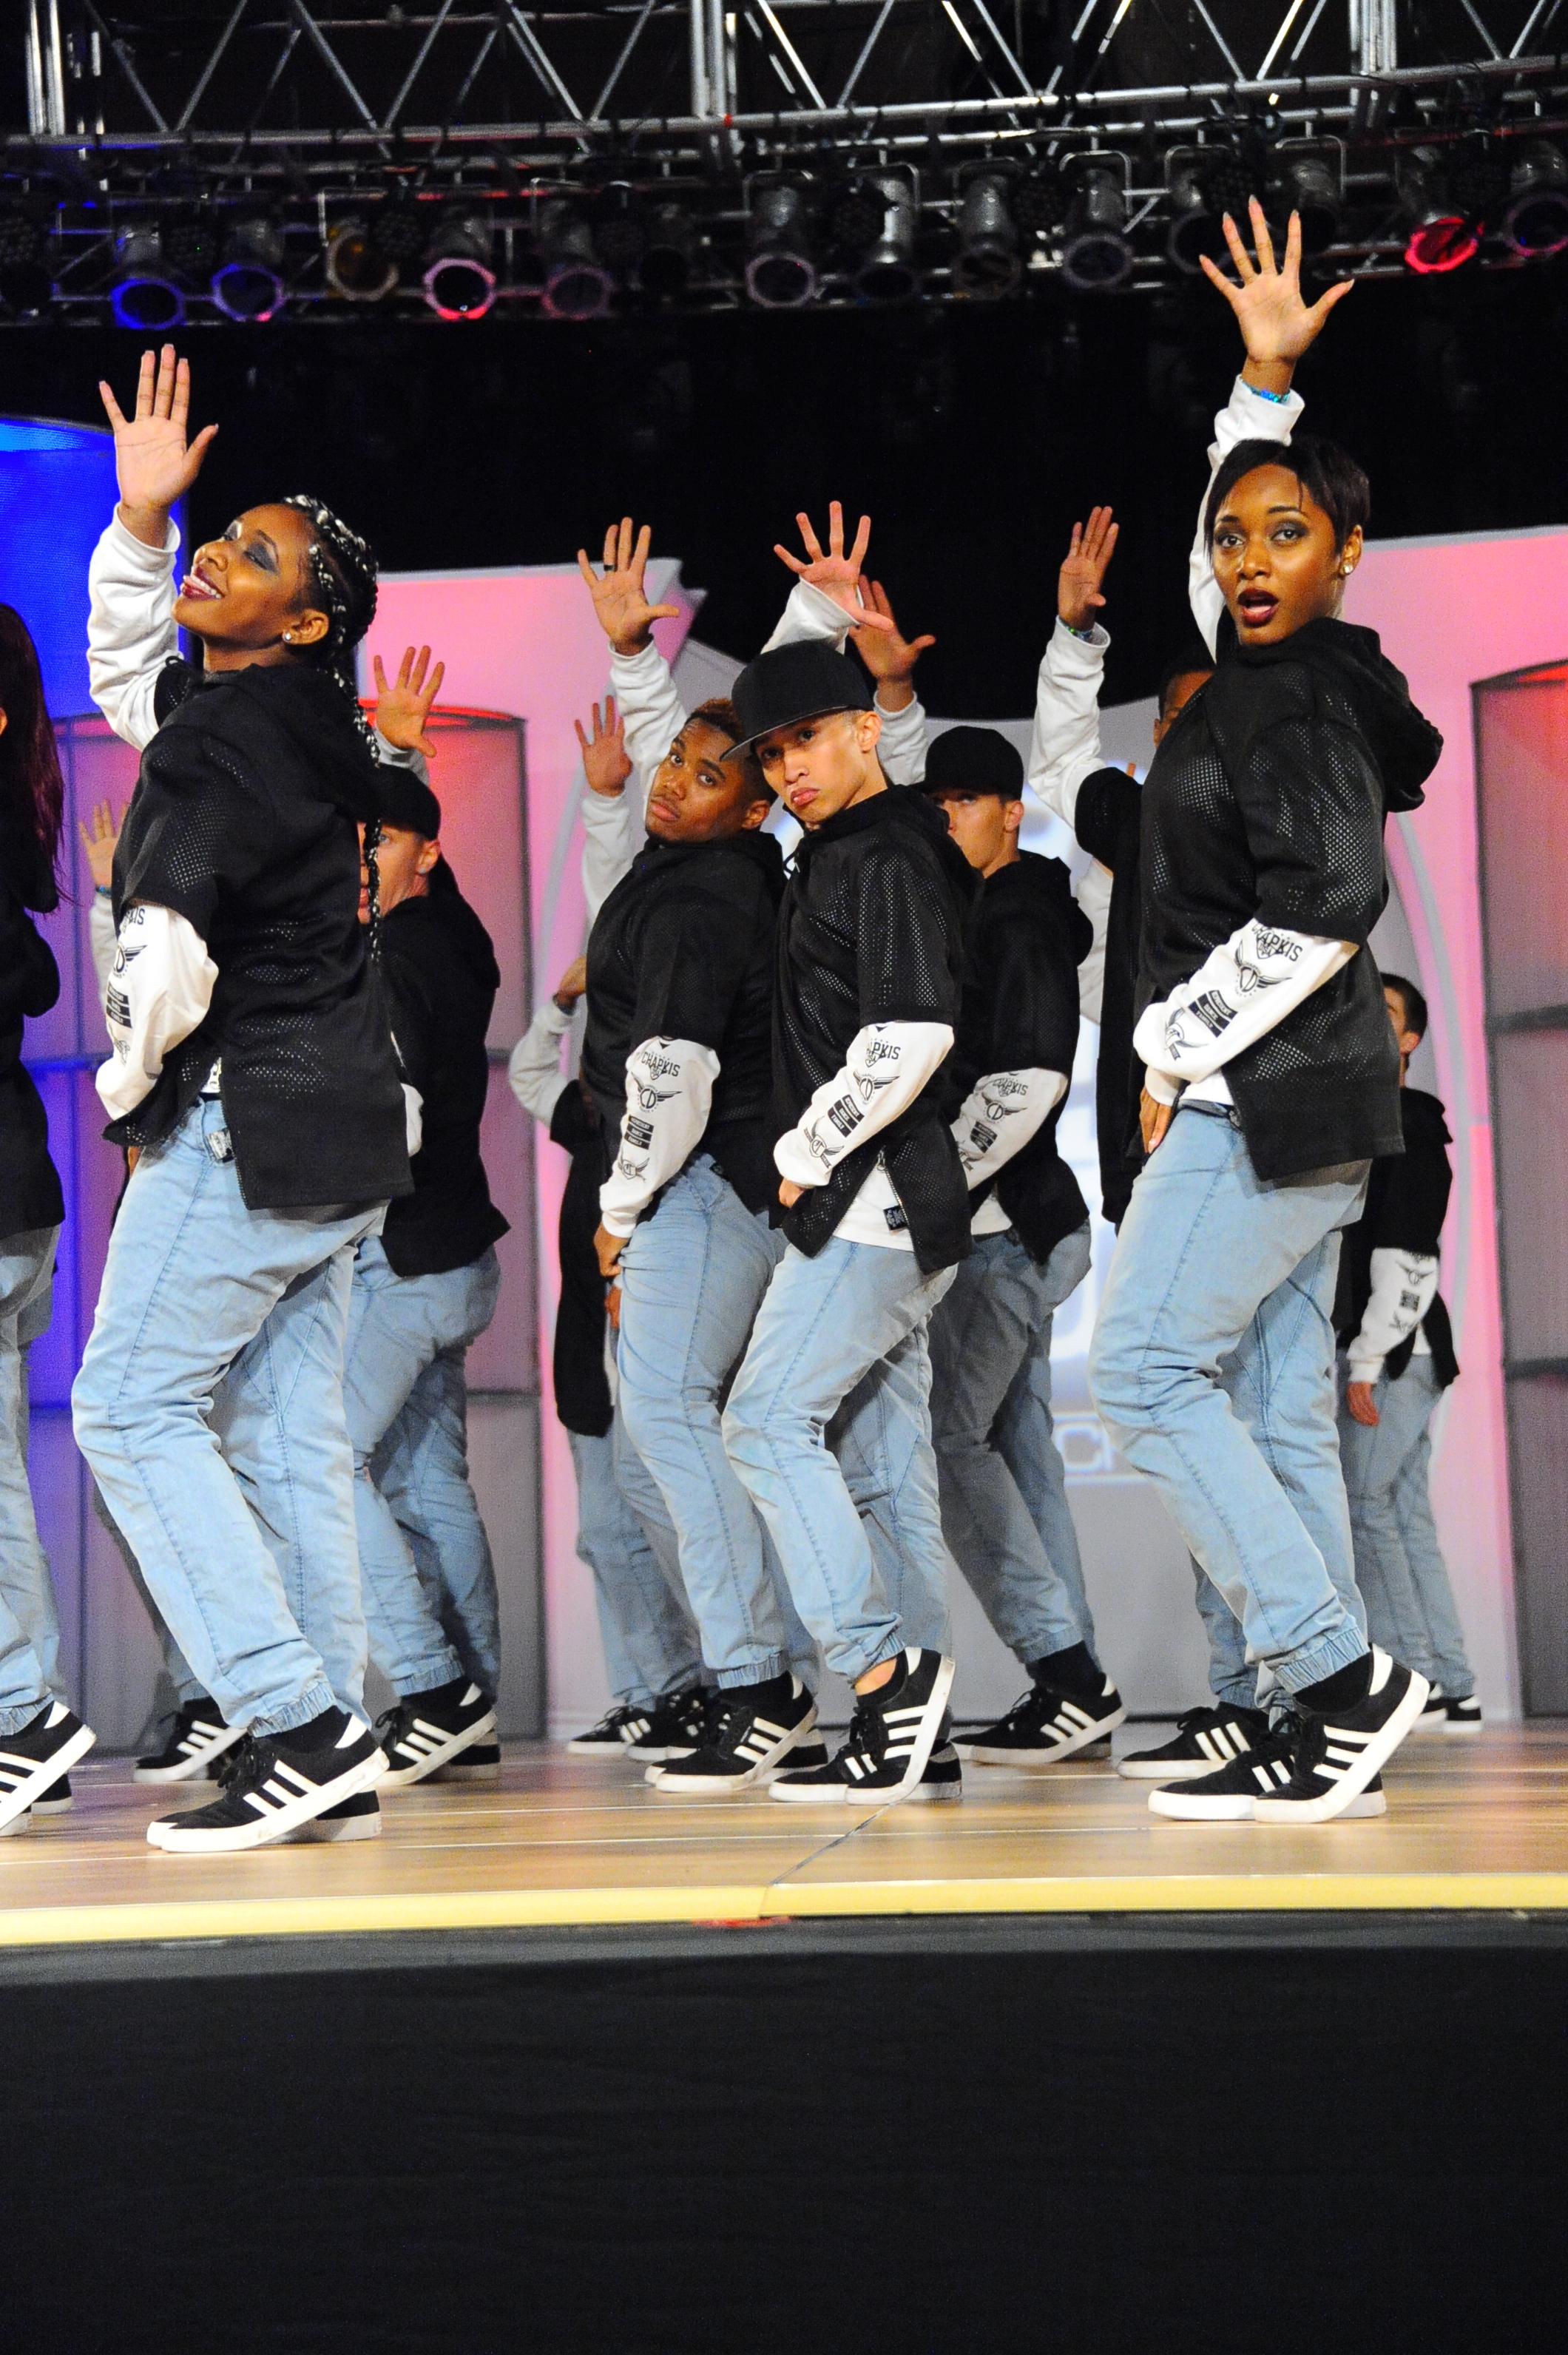 USA_MC_Chapkis Dance Fam_grp2